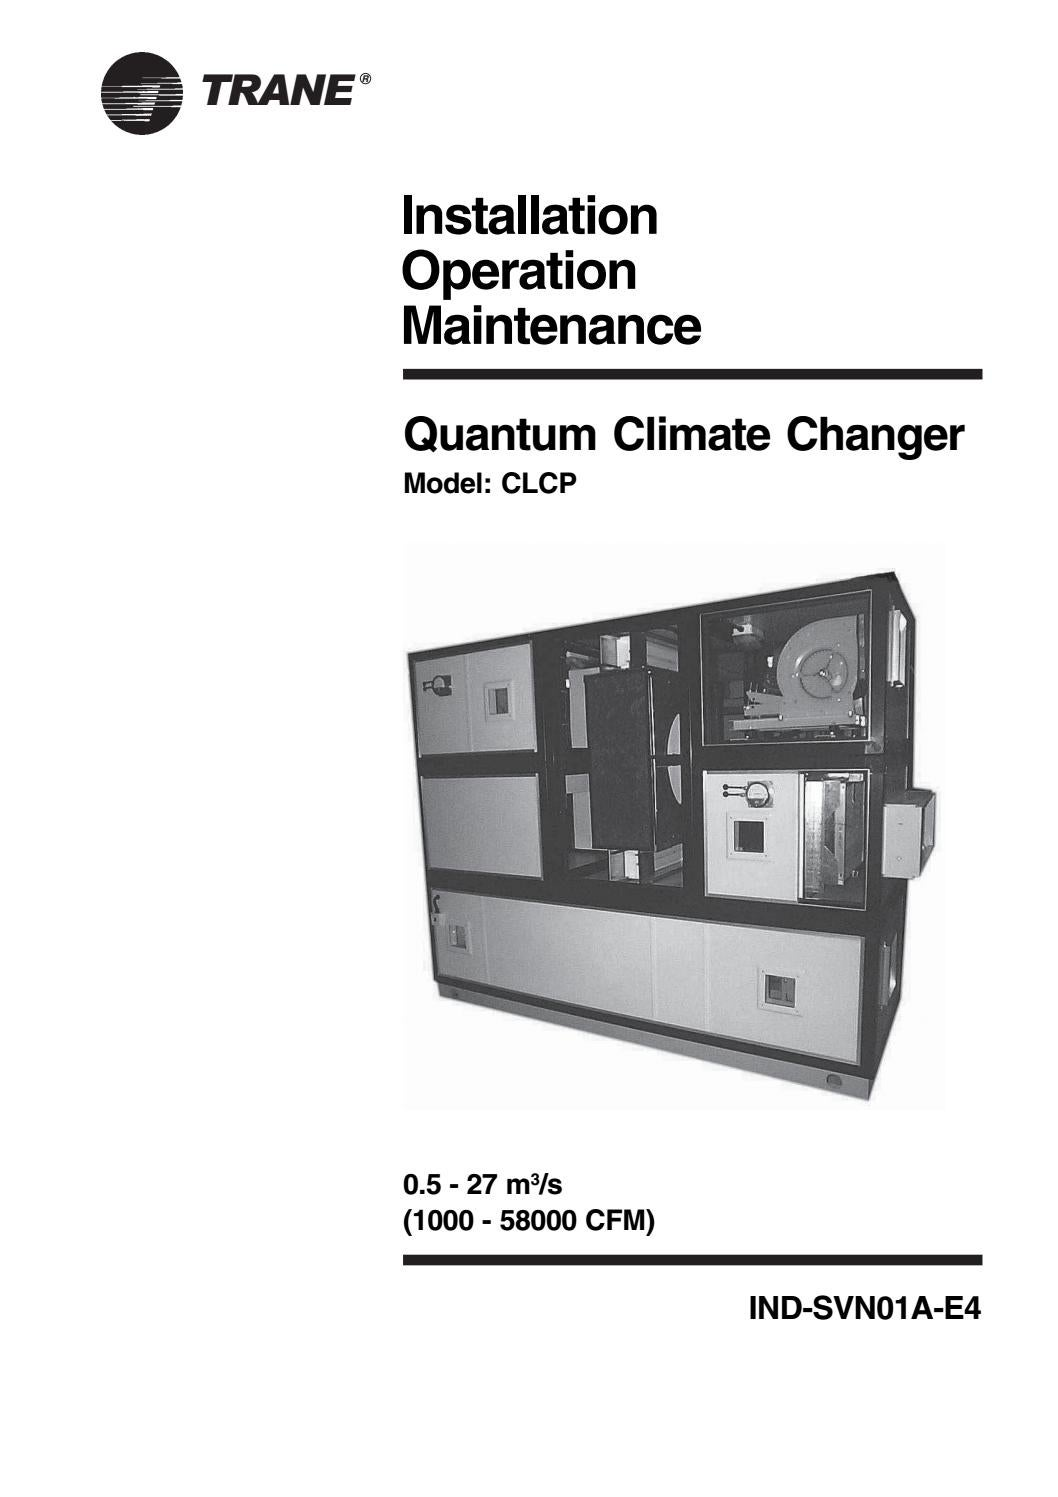 Trane Installation Operation Mantanance Quantum Climate